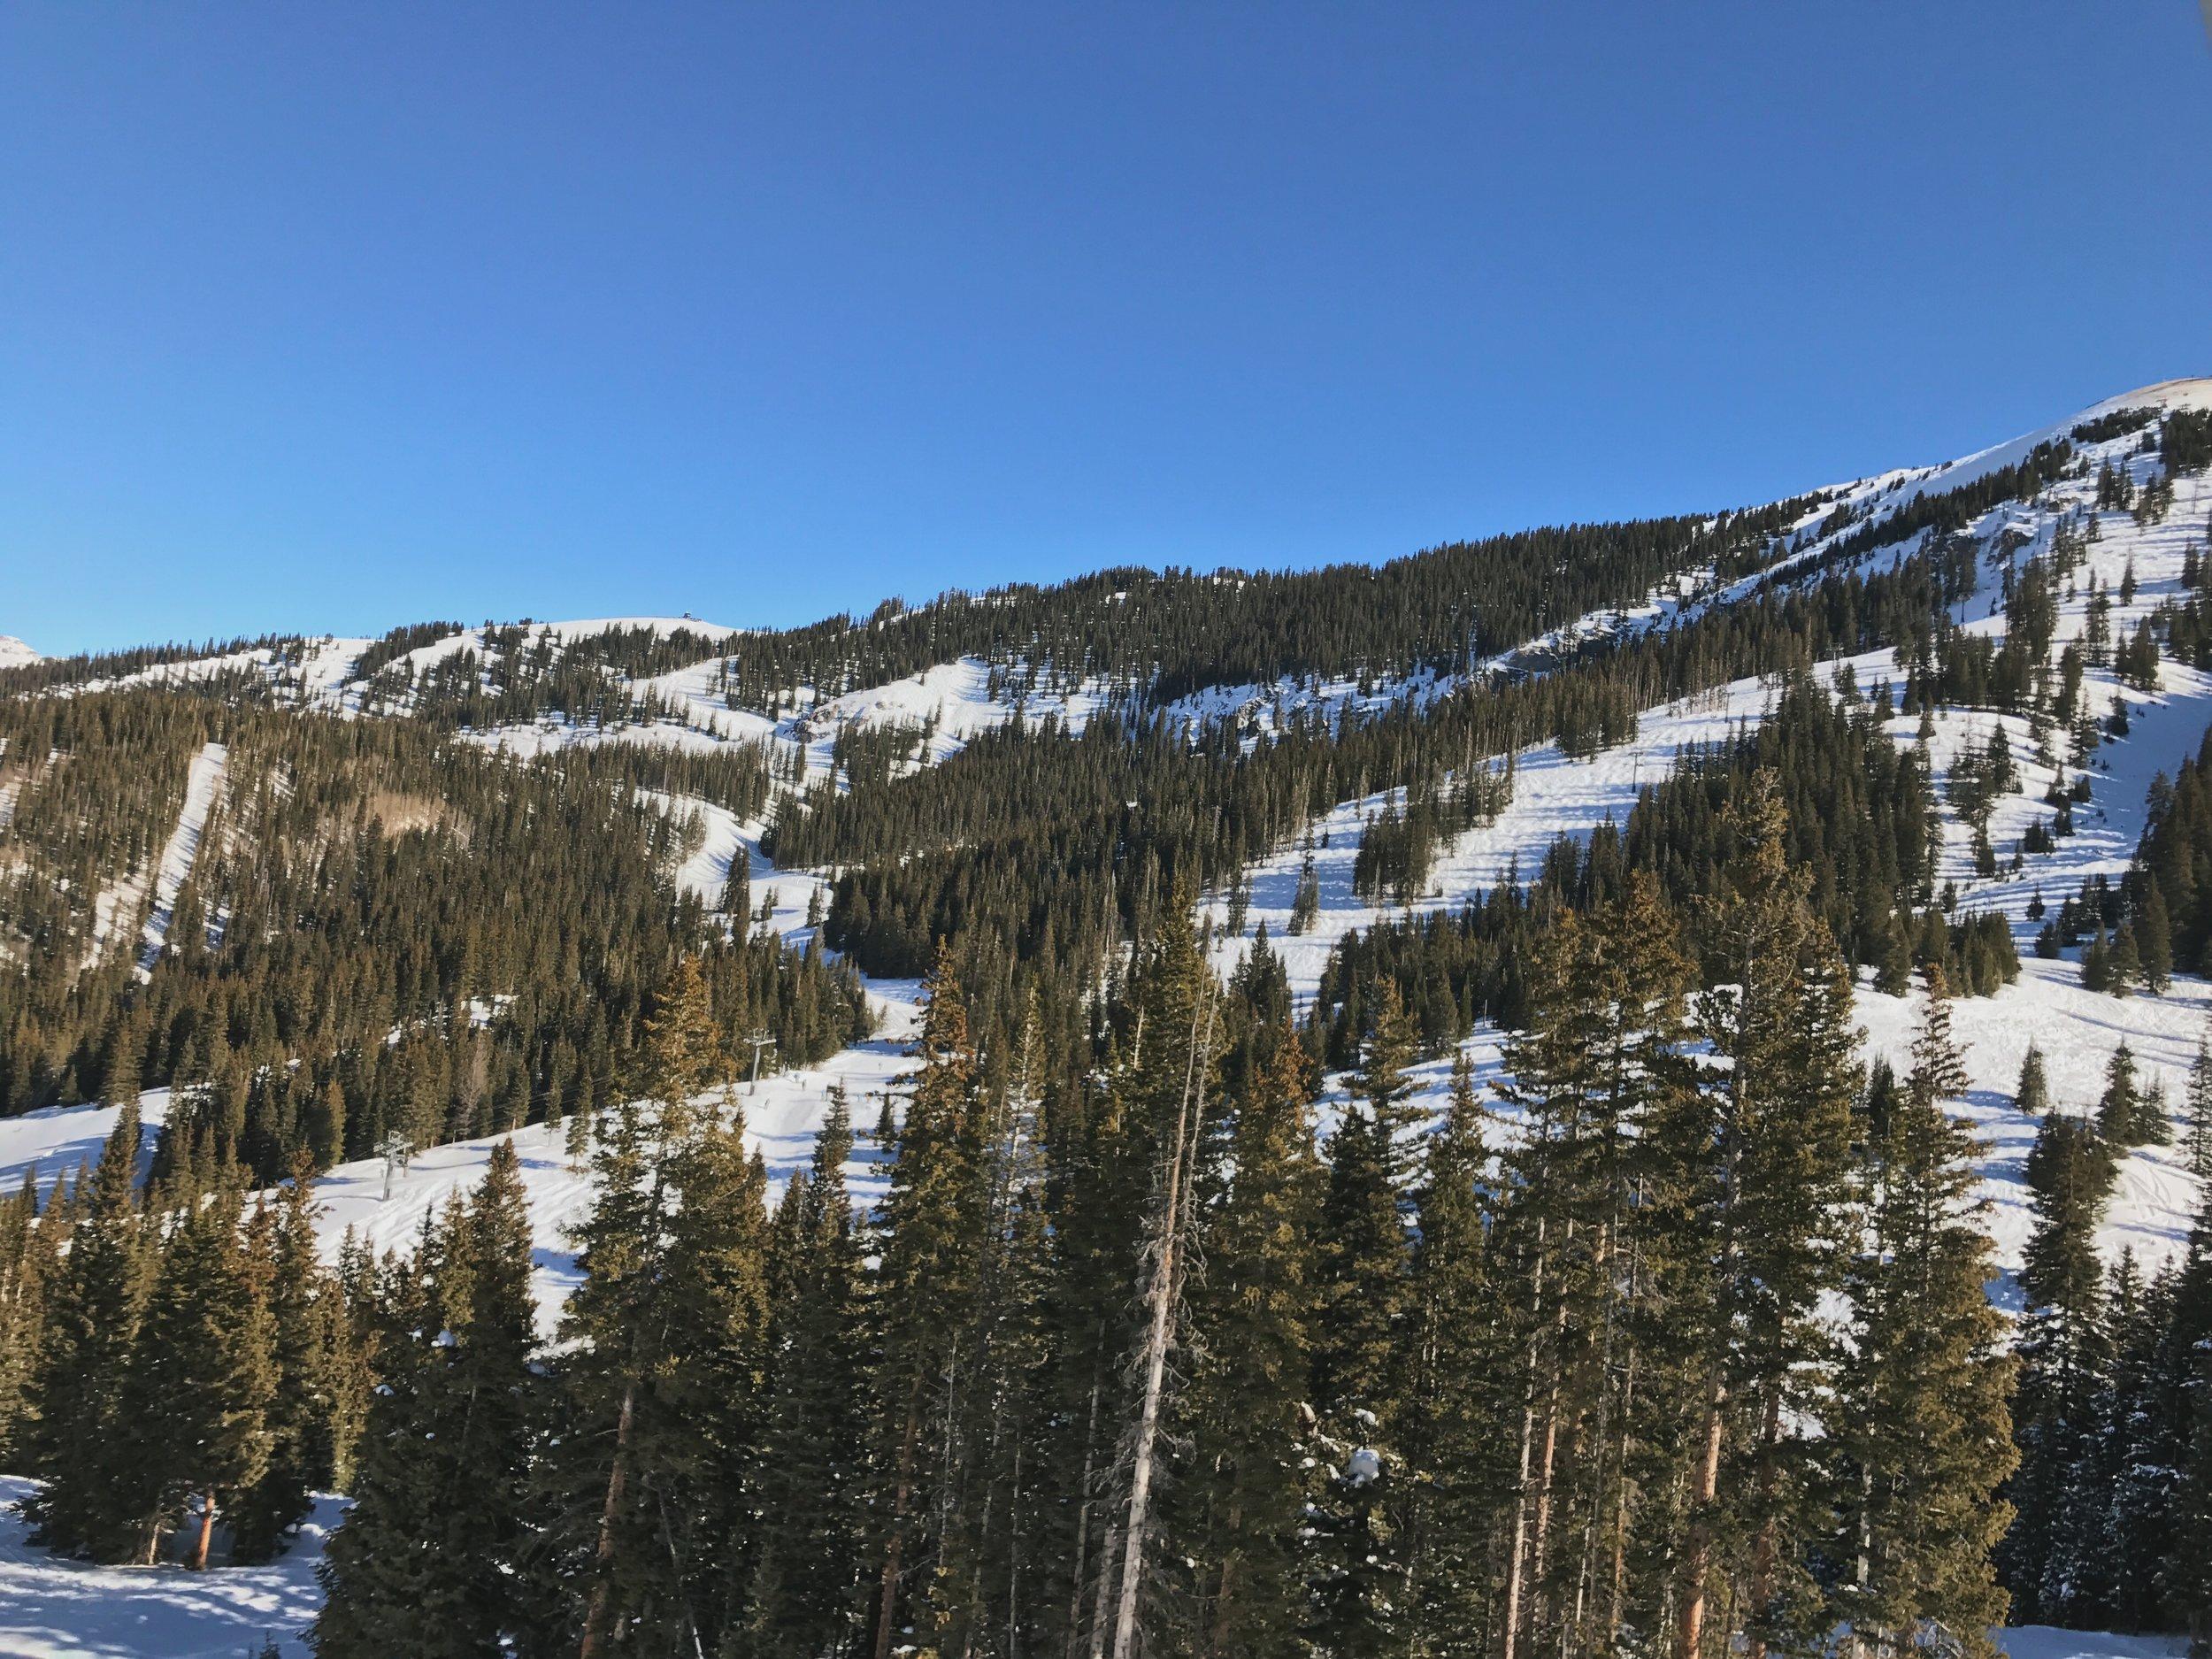 Ski slopes at Telluride CO